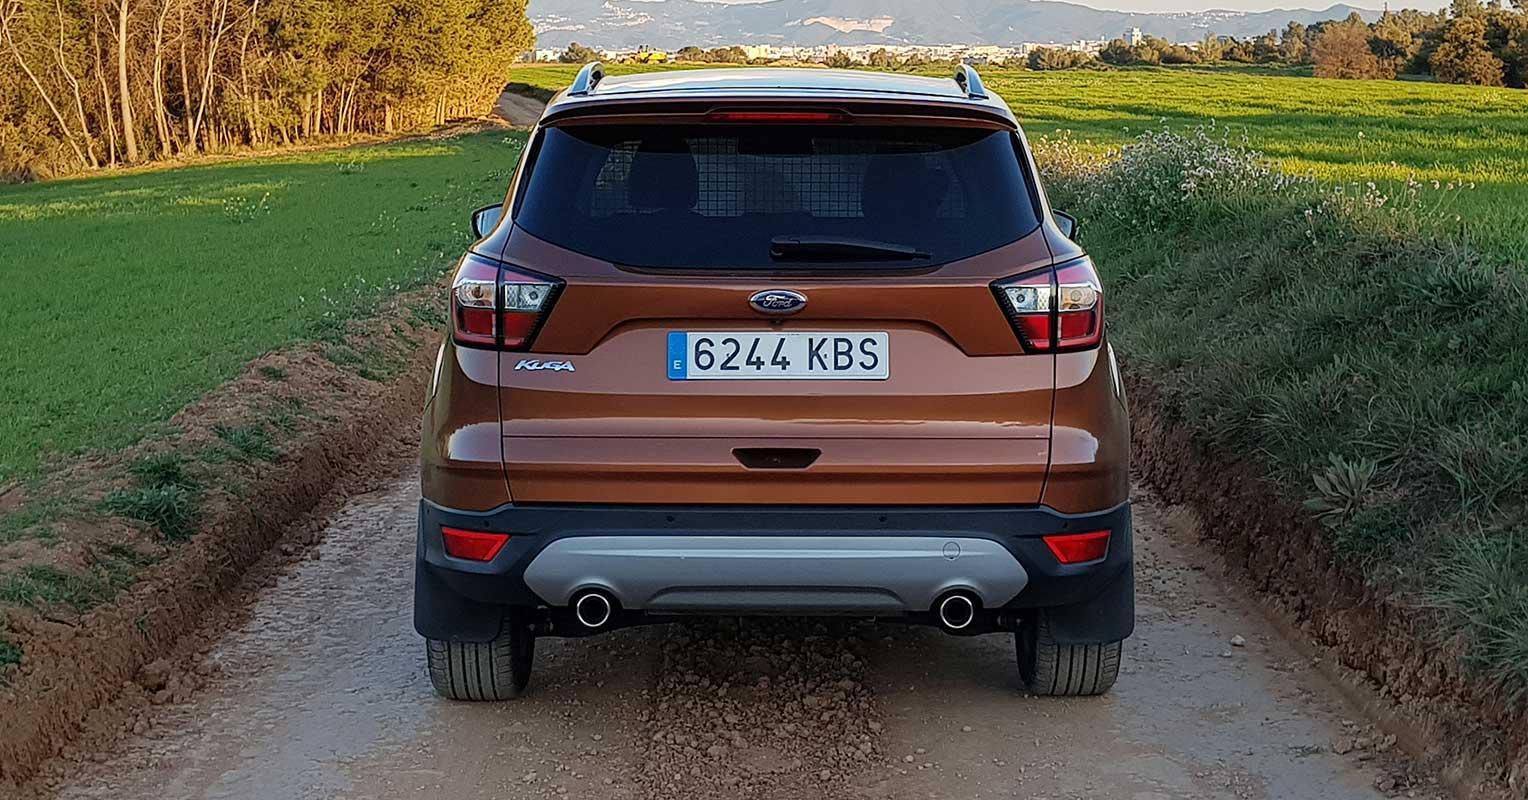 Trasera del Ford Kuga Titanium 2018